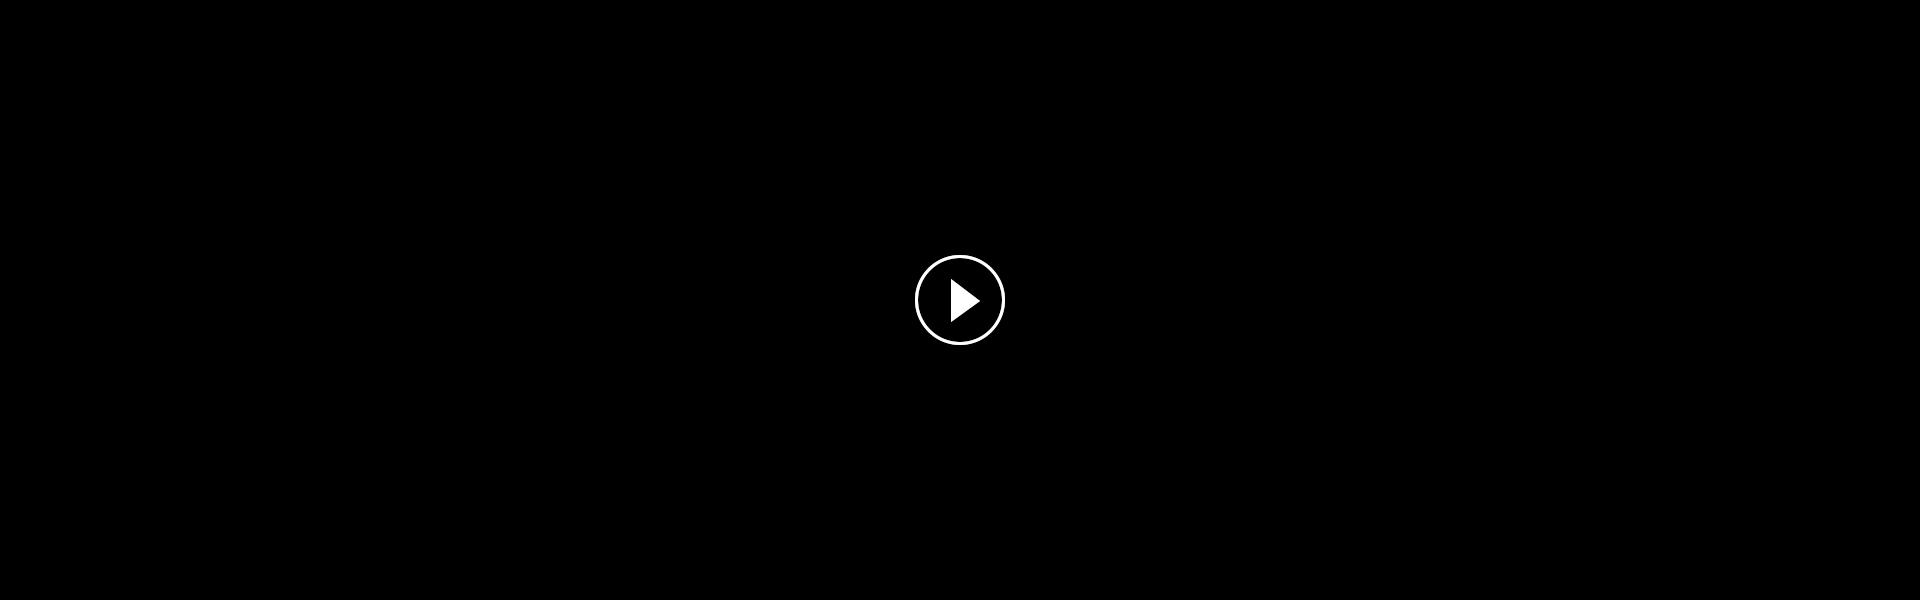 bg video play